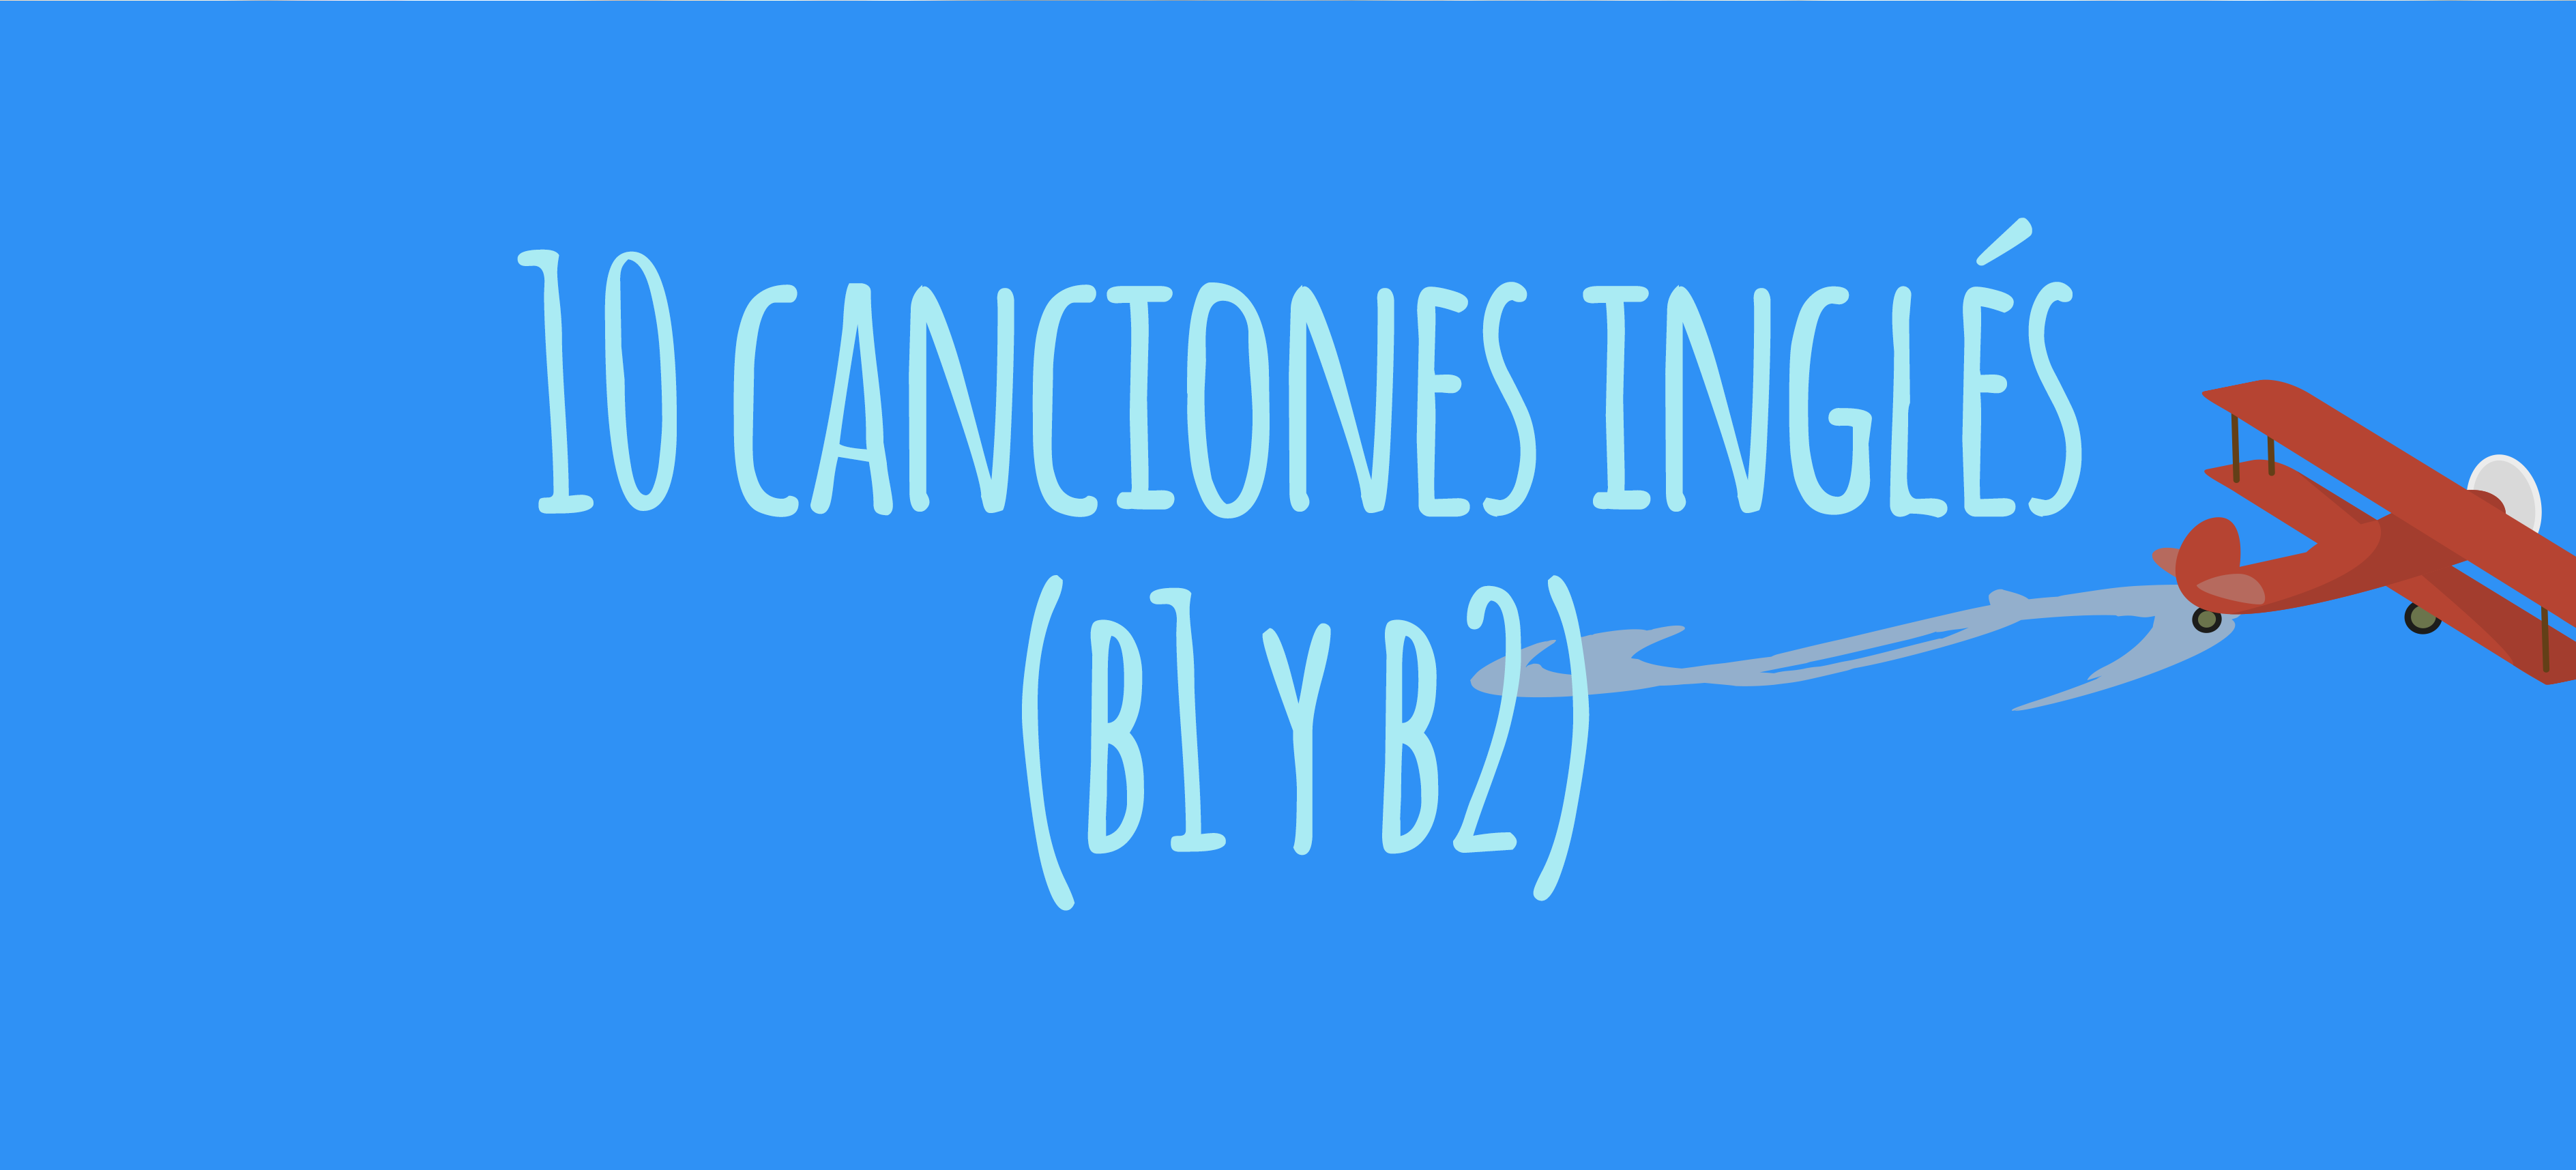 10-canciones-B1-y-B2